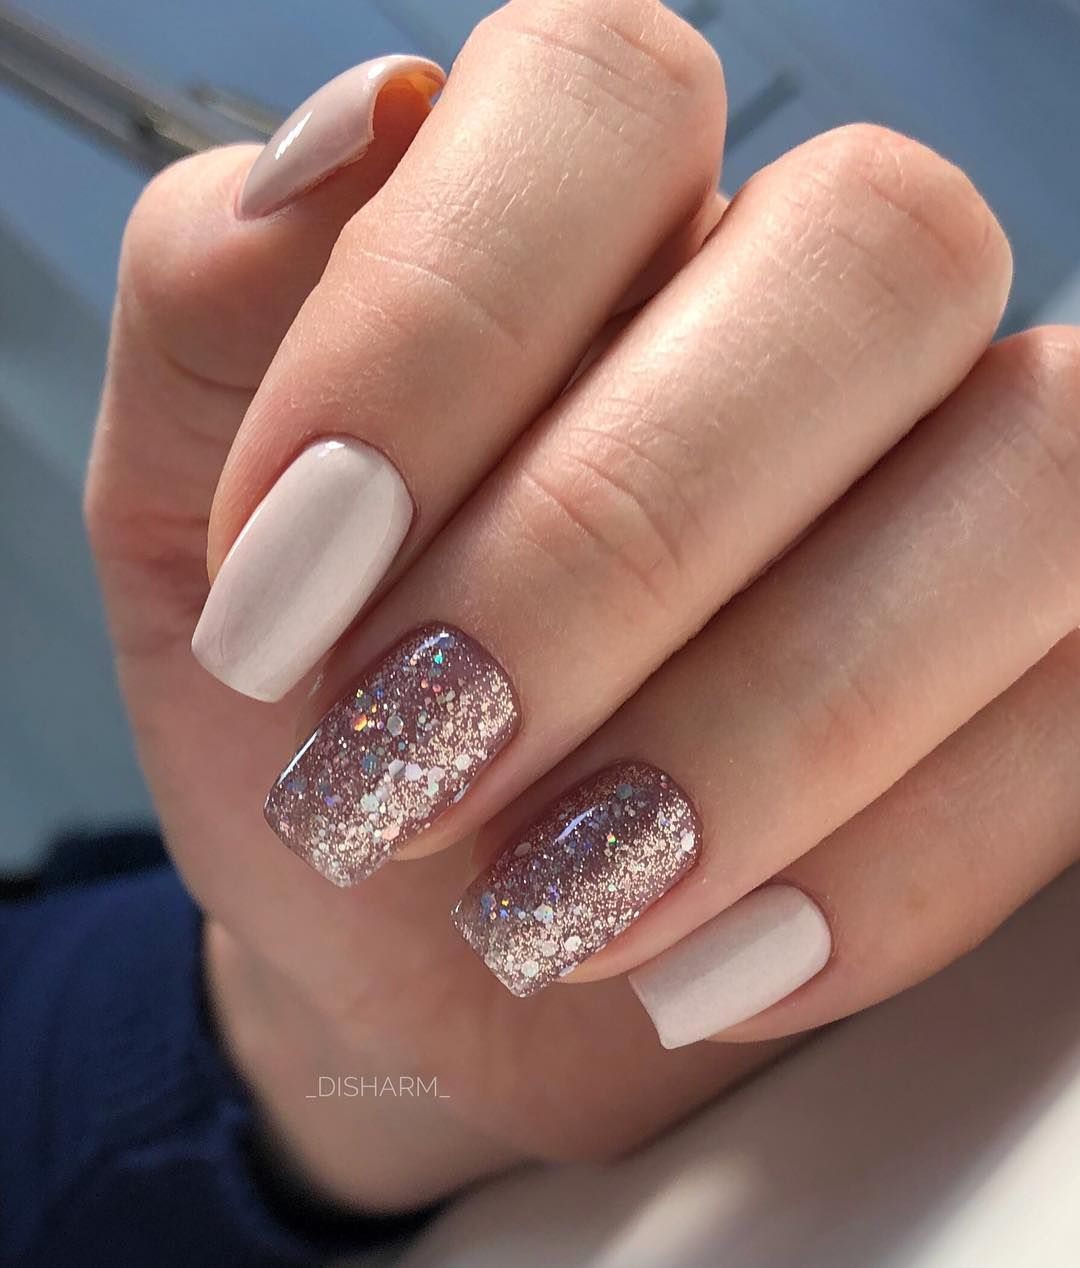 Stunning nail art design